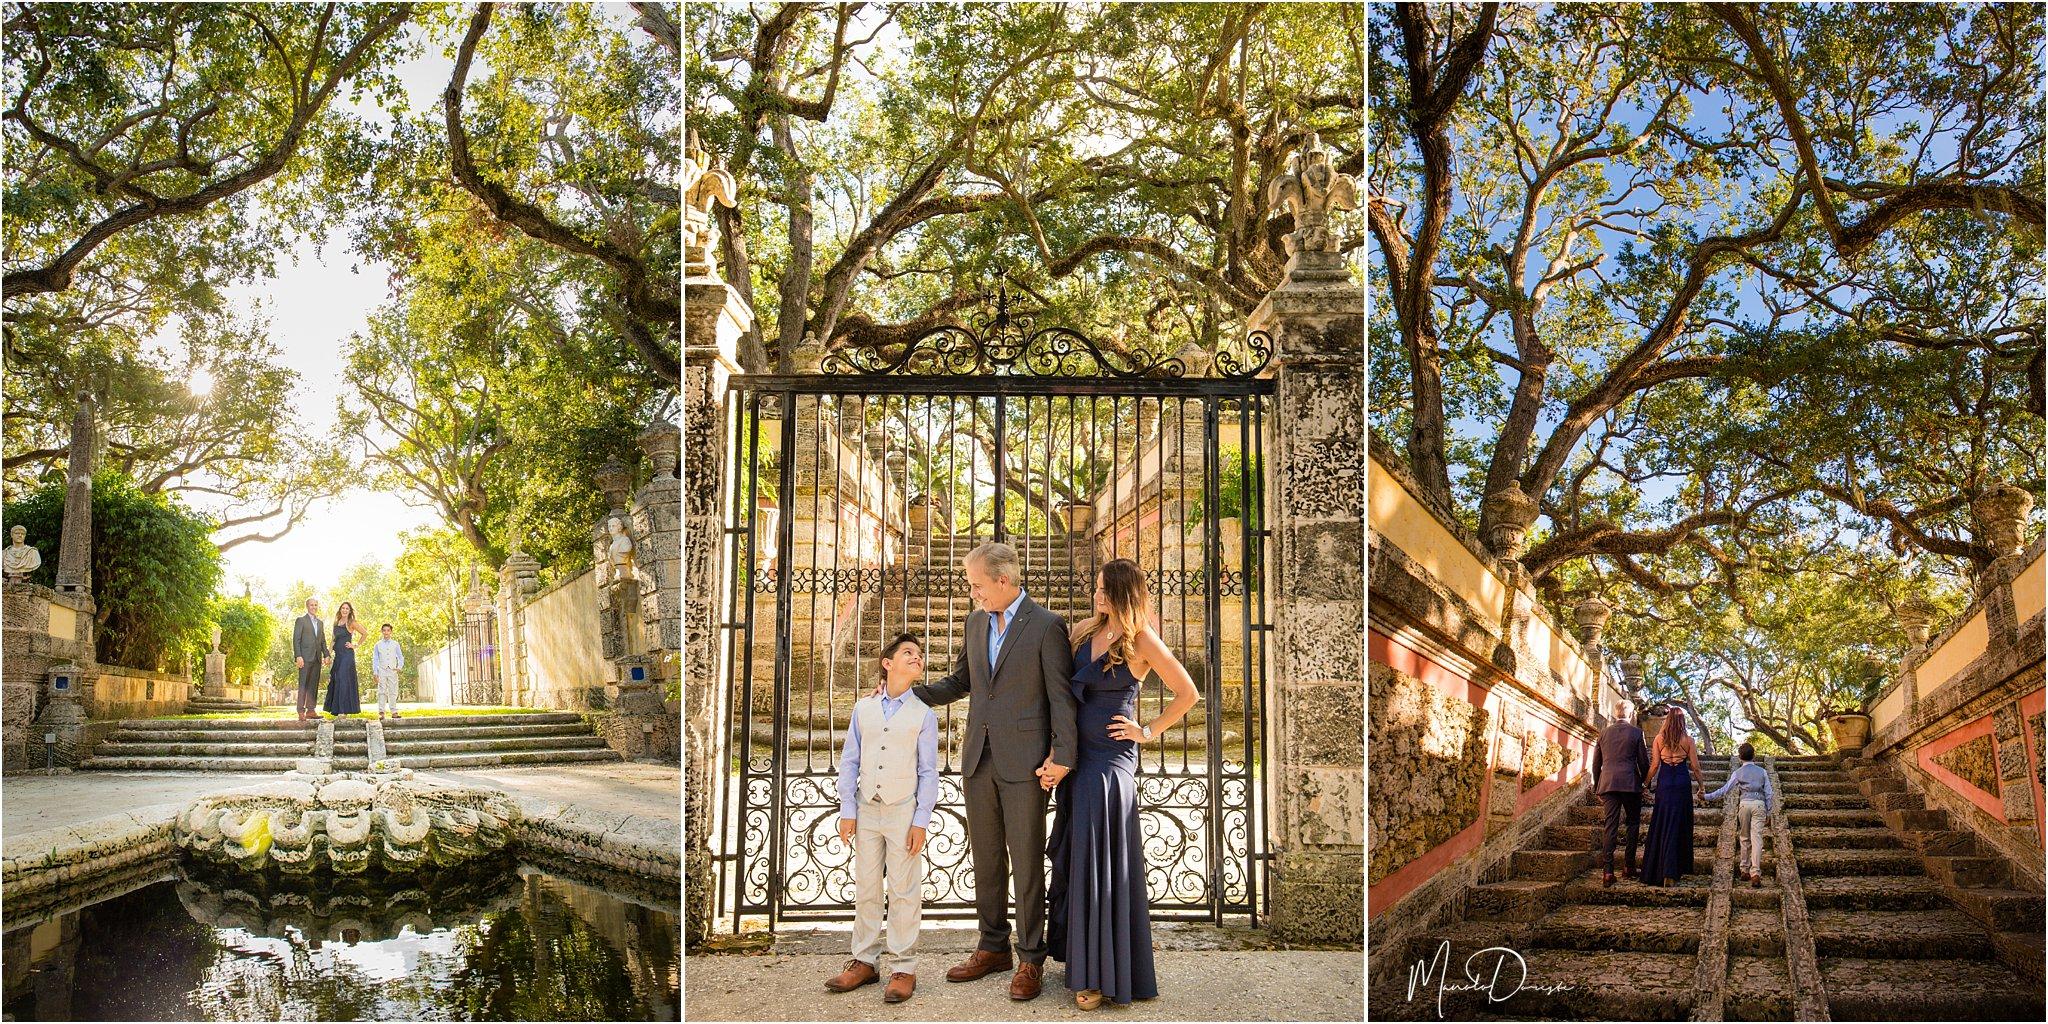 0072_ManoloDoreste_InFocusStudios_Wedding_Family_Photography_Miami_MiamiPhotographer.jpg